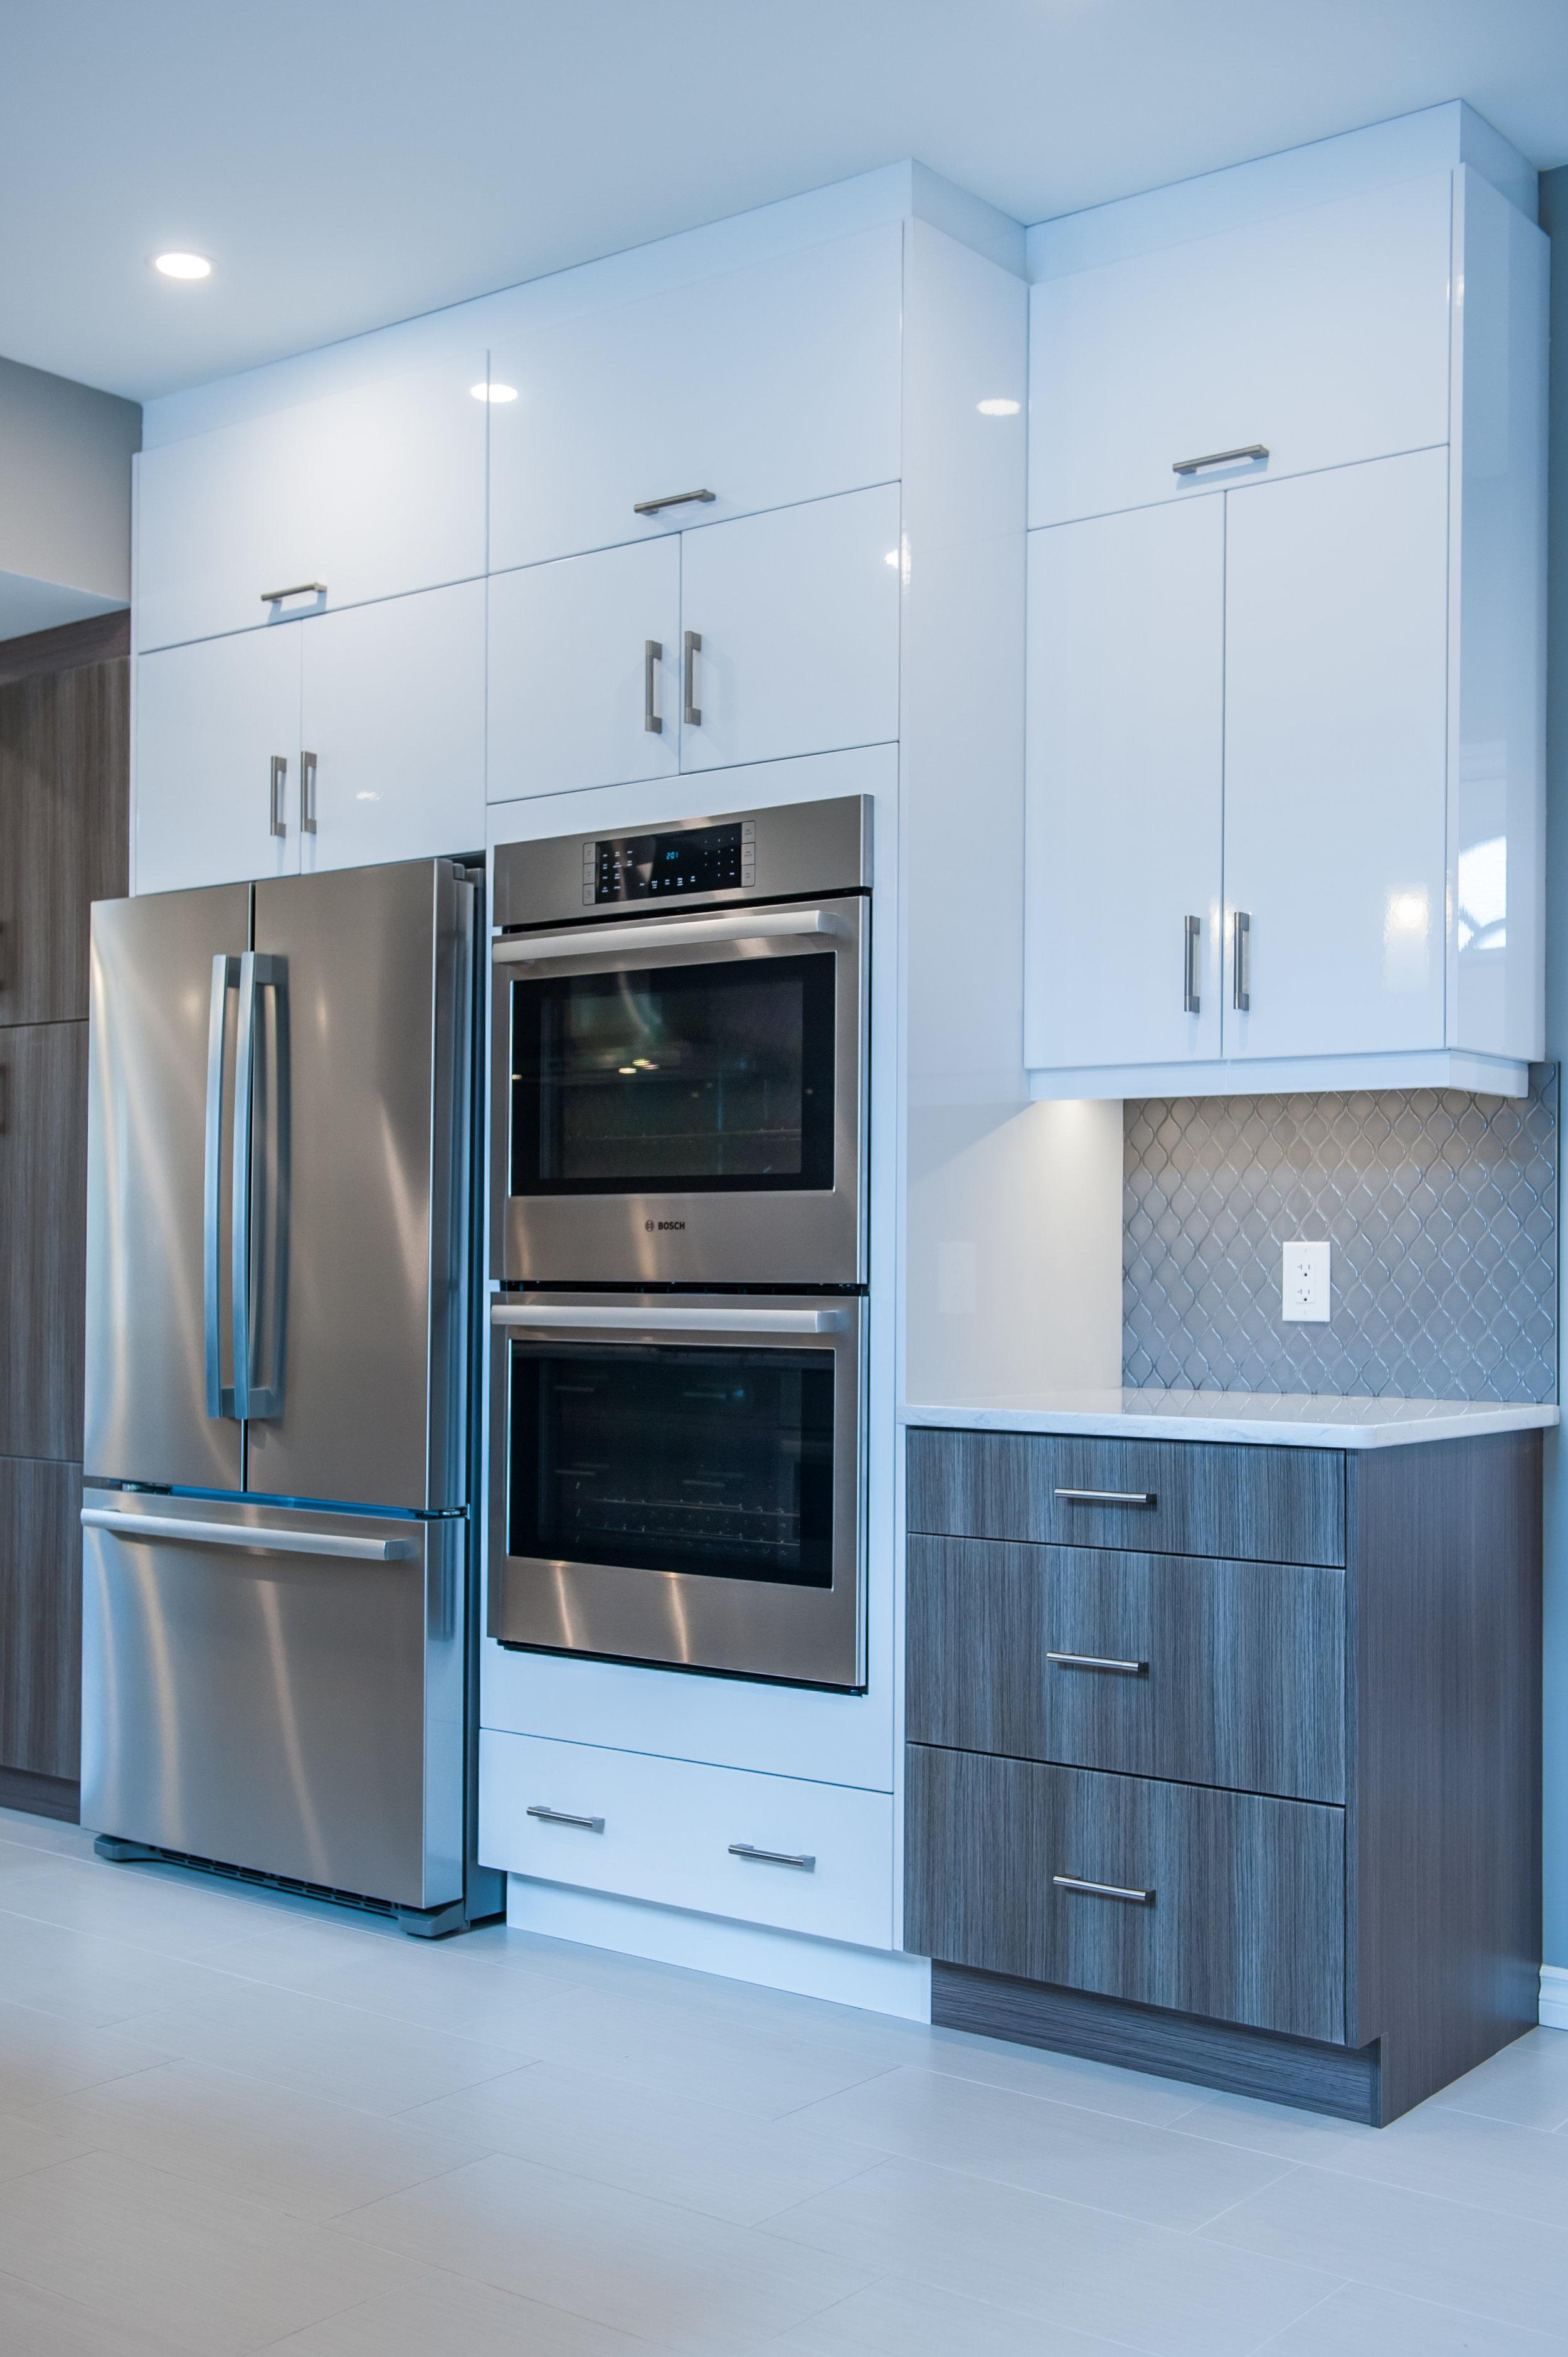 White_cabinetry_modern_kitchen